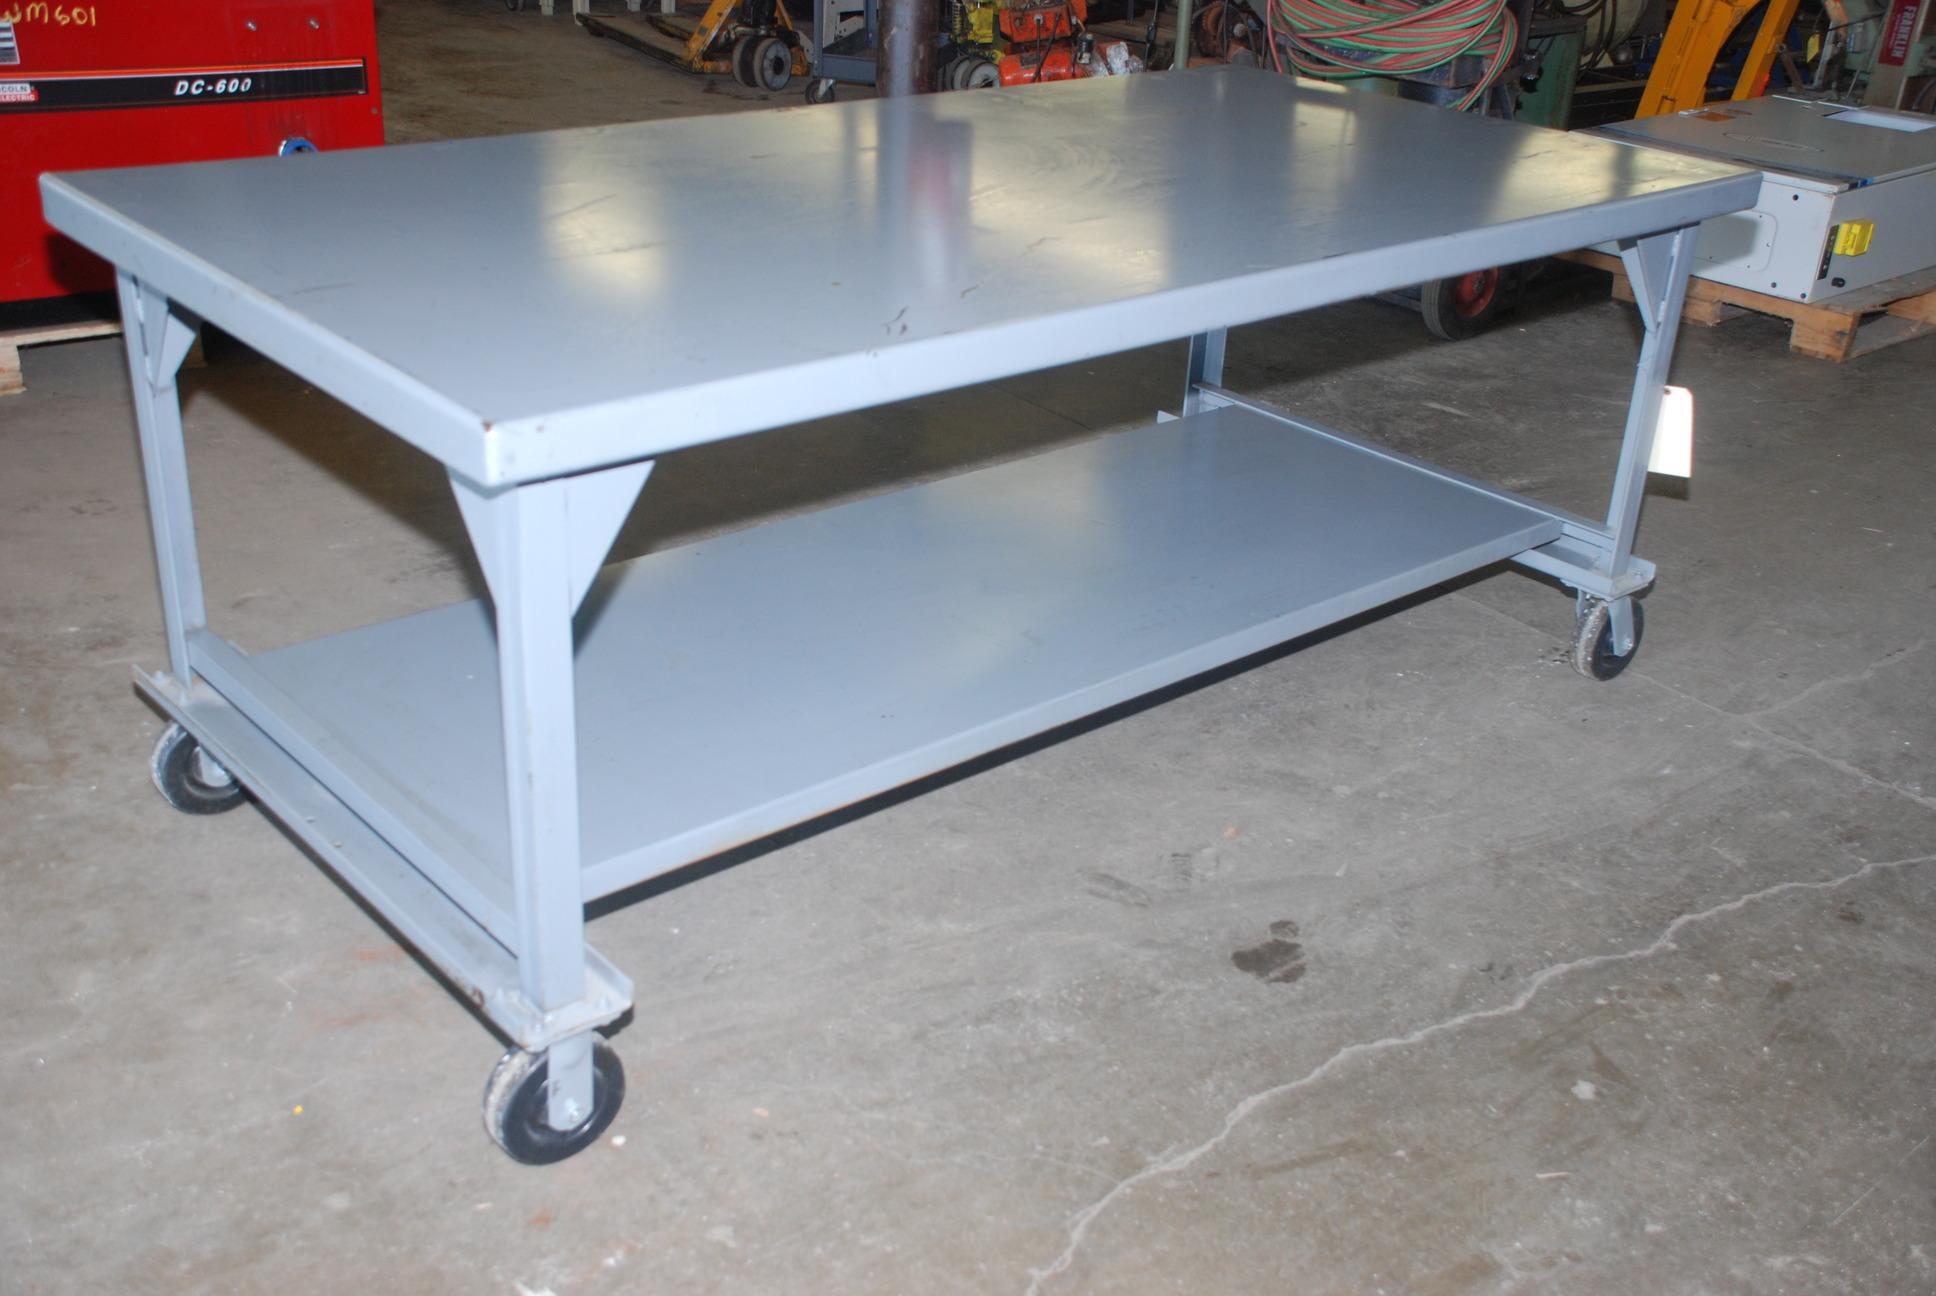 Wow Hercules Type Heavy Duty Work Bench Or Welding Table On Casters Inv 6097 Ebay